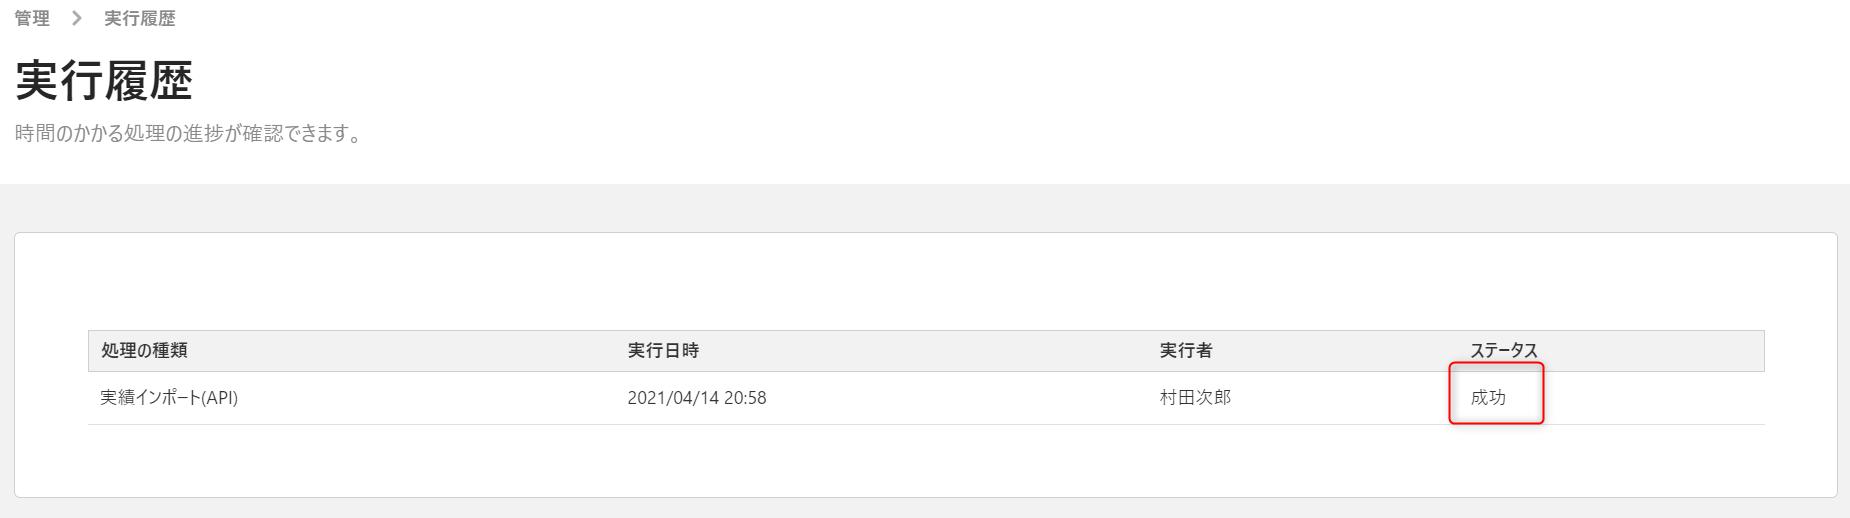 2021-06-11_18h04_04.png (30.6 kB)